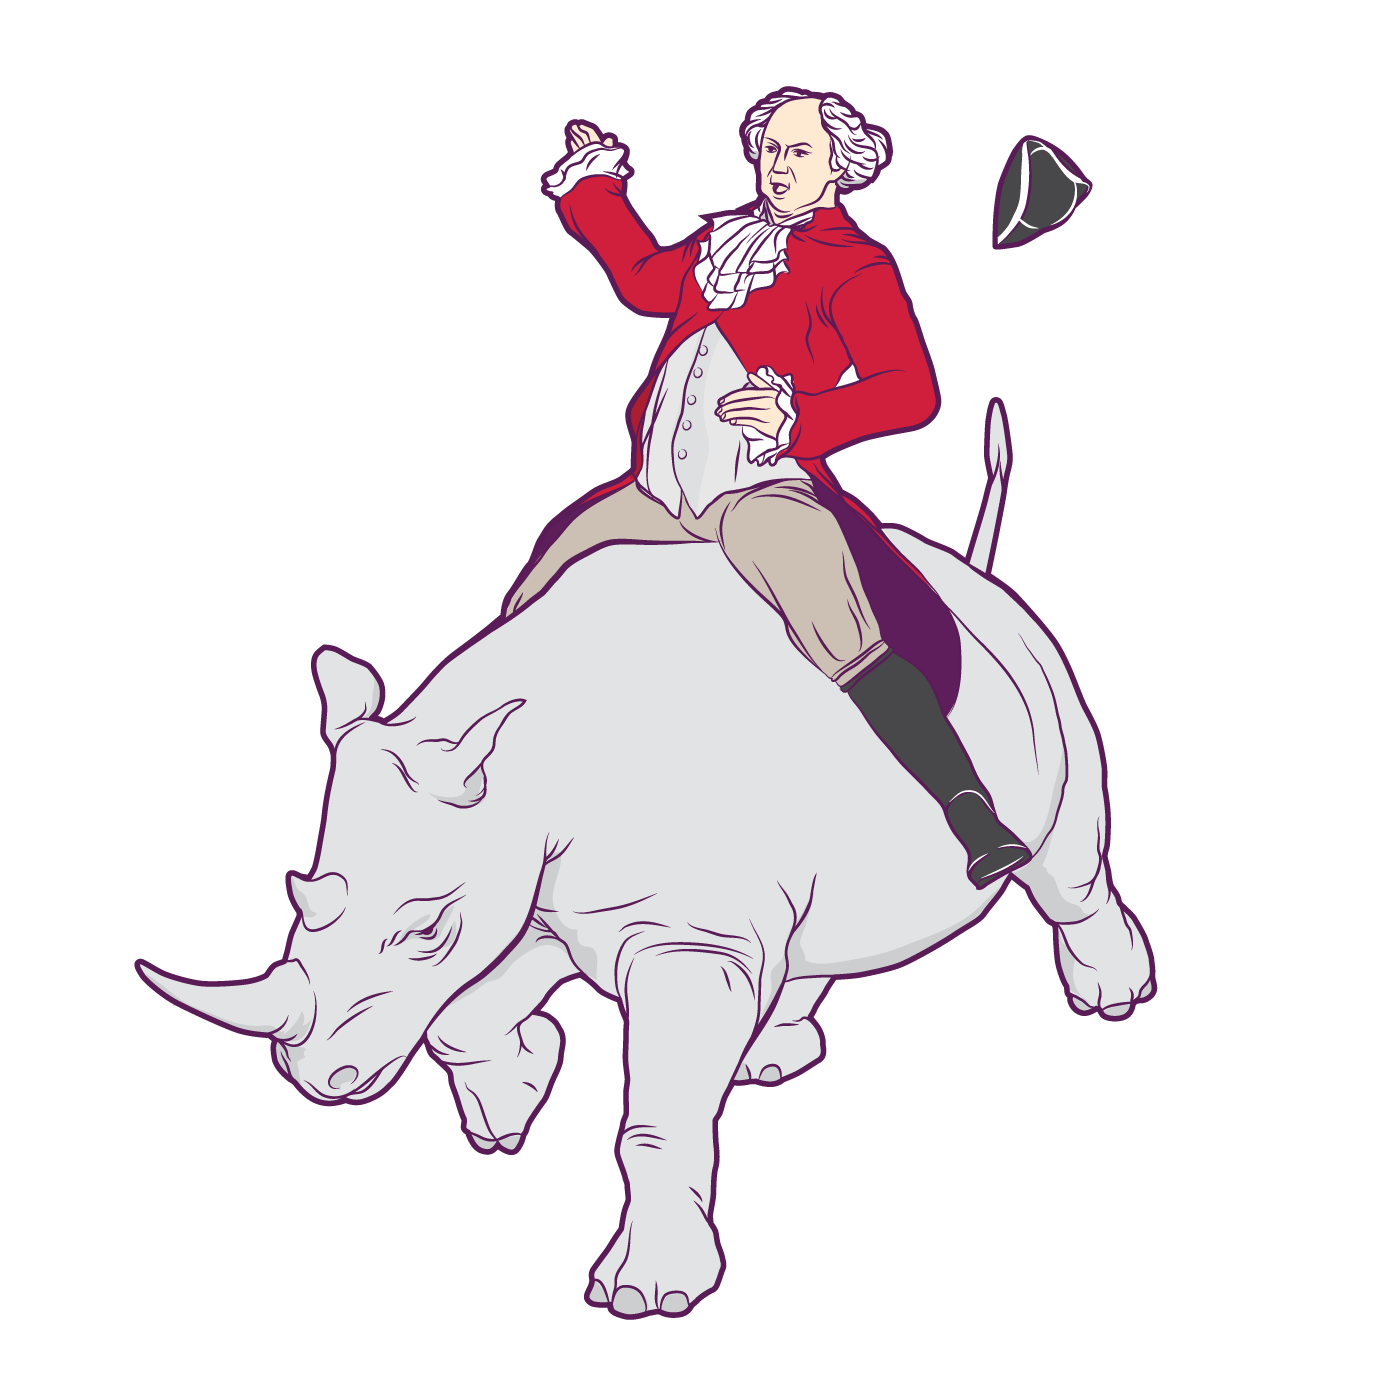 Virgin Mobile, Infographic by Max Hancock, John Adams riding a Rhino.